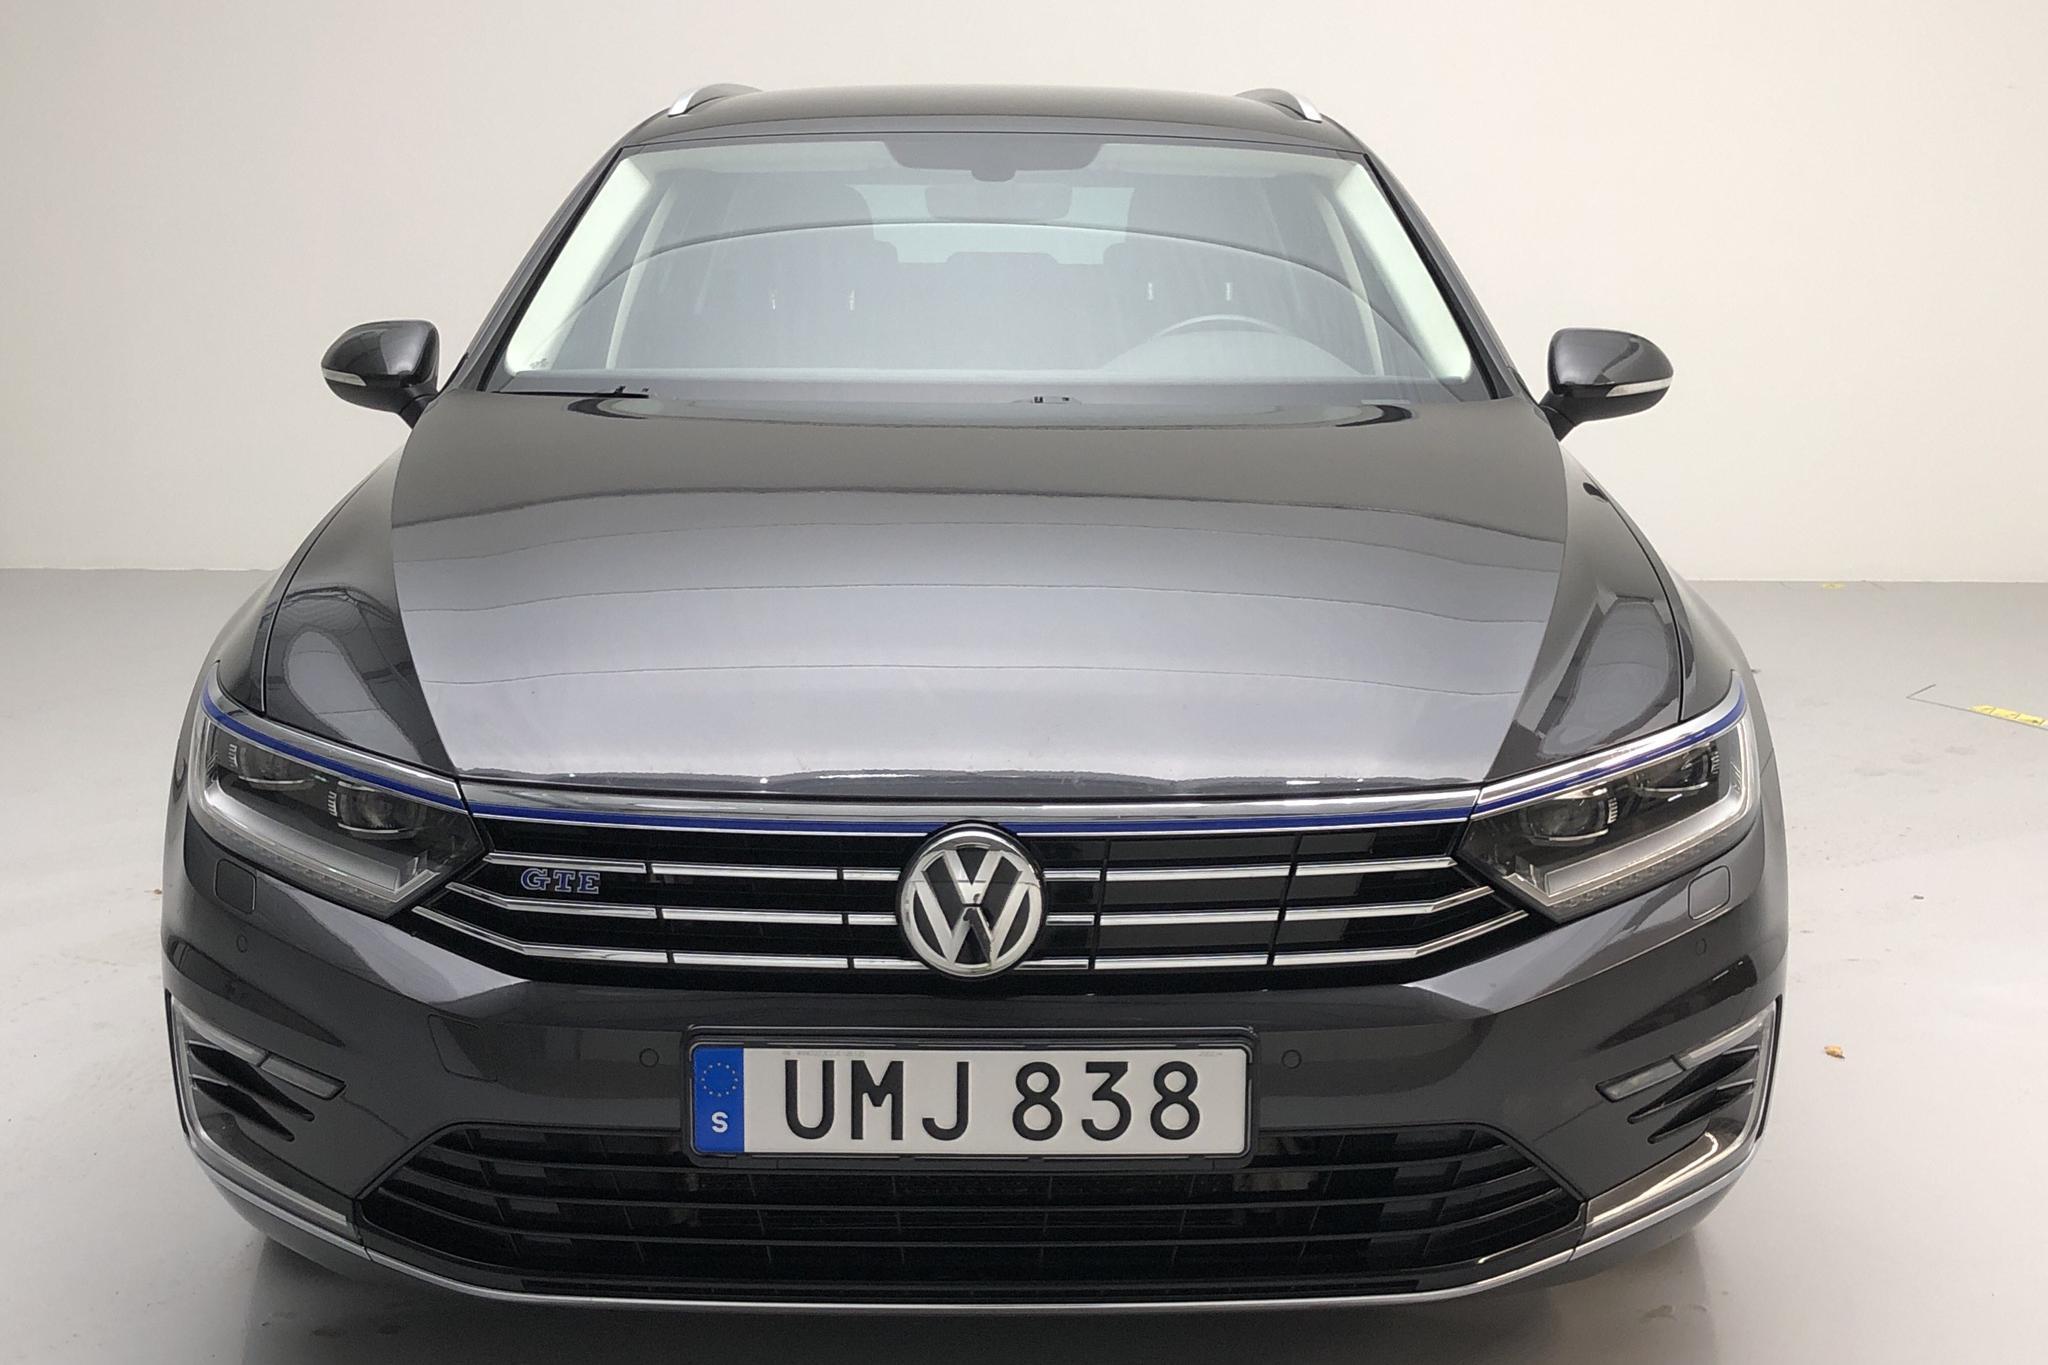 VW Passat 1.4 Plug-in-Hybrid Sportscombi (218hk) - 119 340 km - Automatic - Dark Grey - 2018